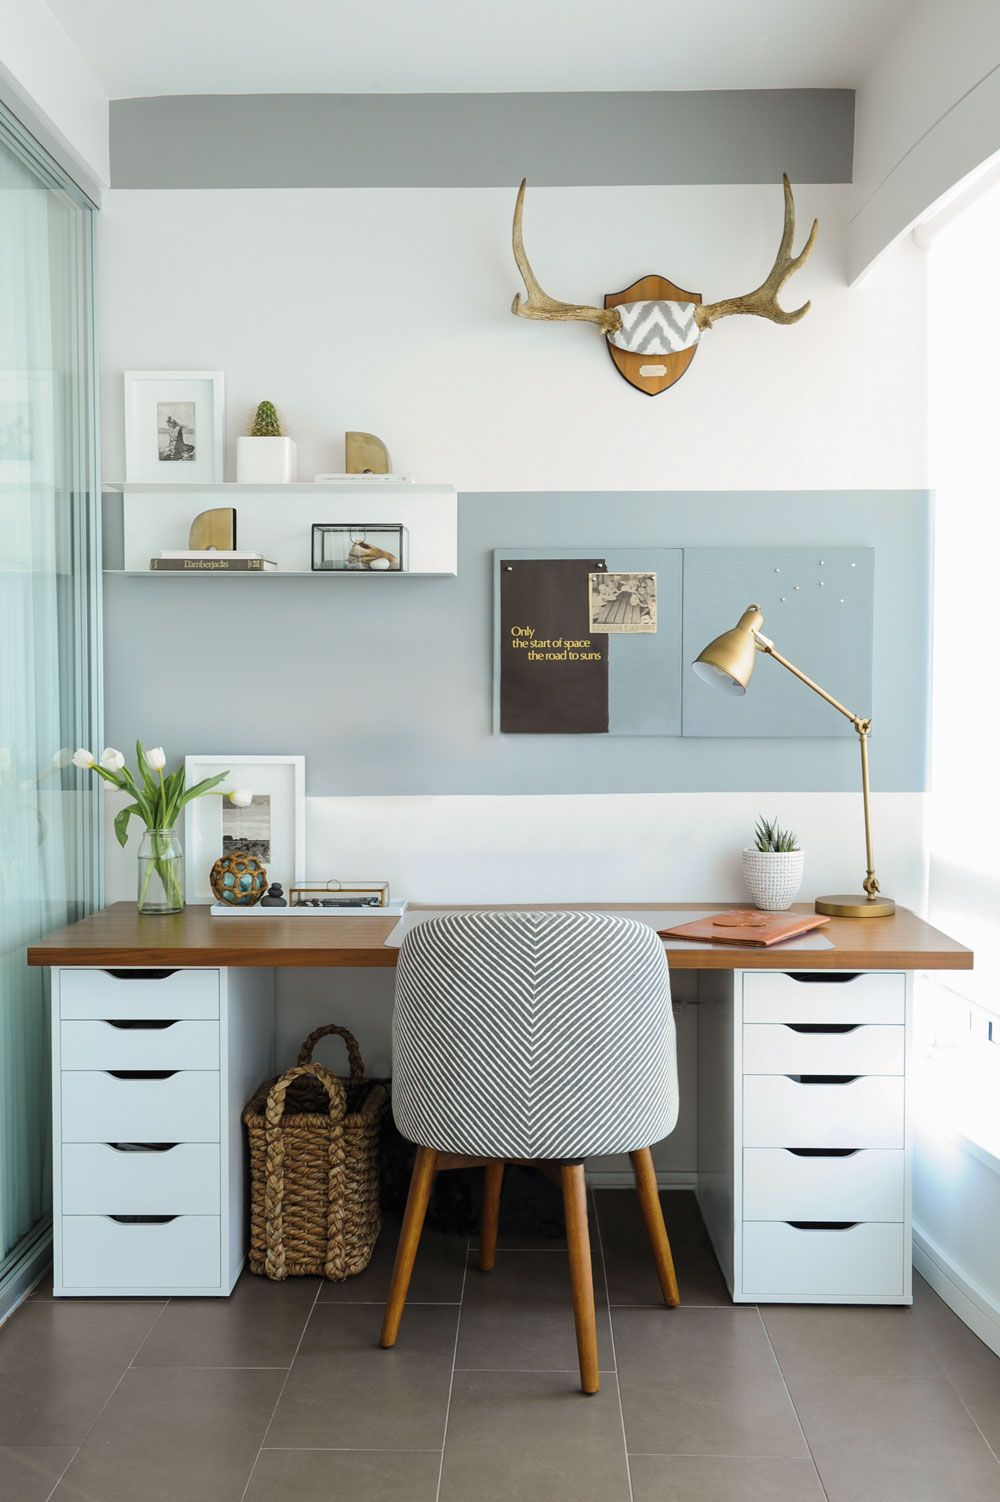 schicker Stuhl | Arbeitszimmer | Bureau, Deco bureau und Mobilier de ...